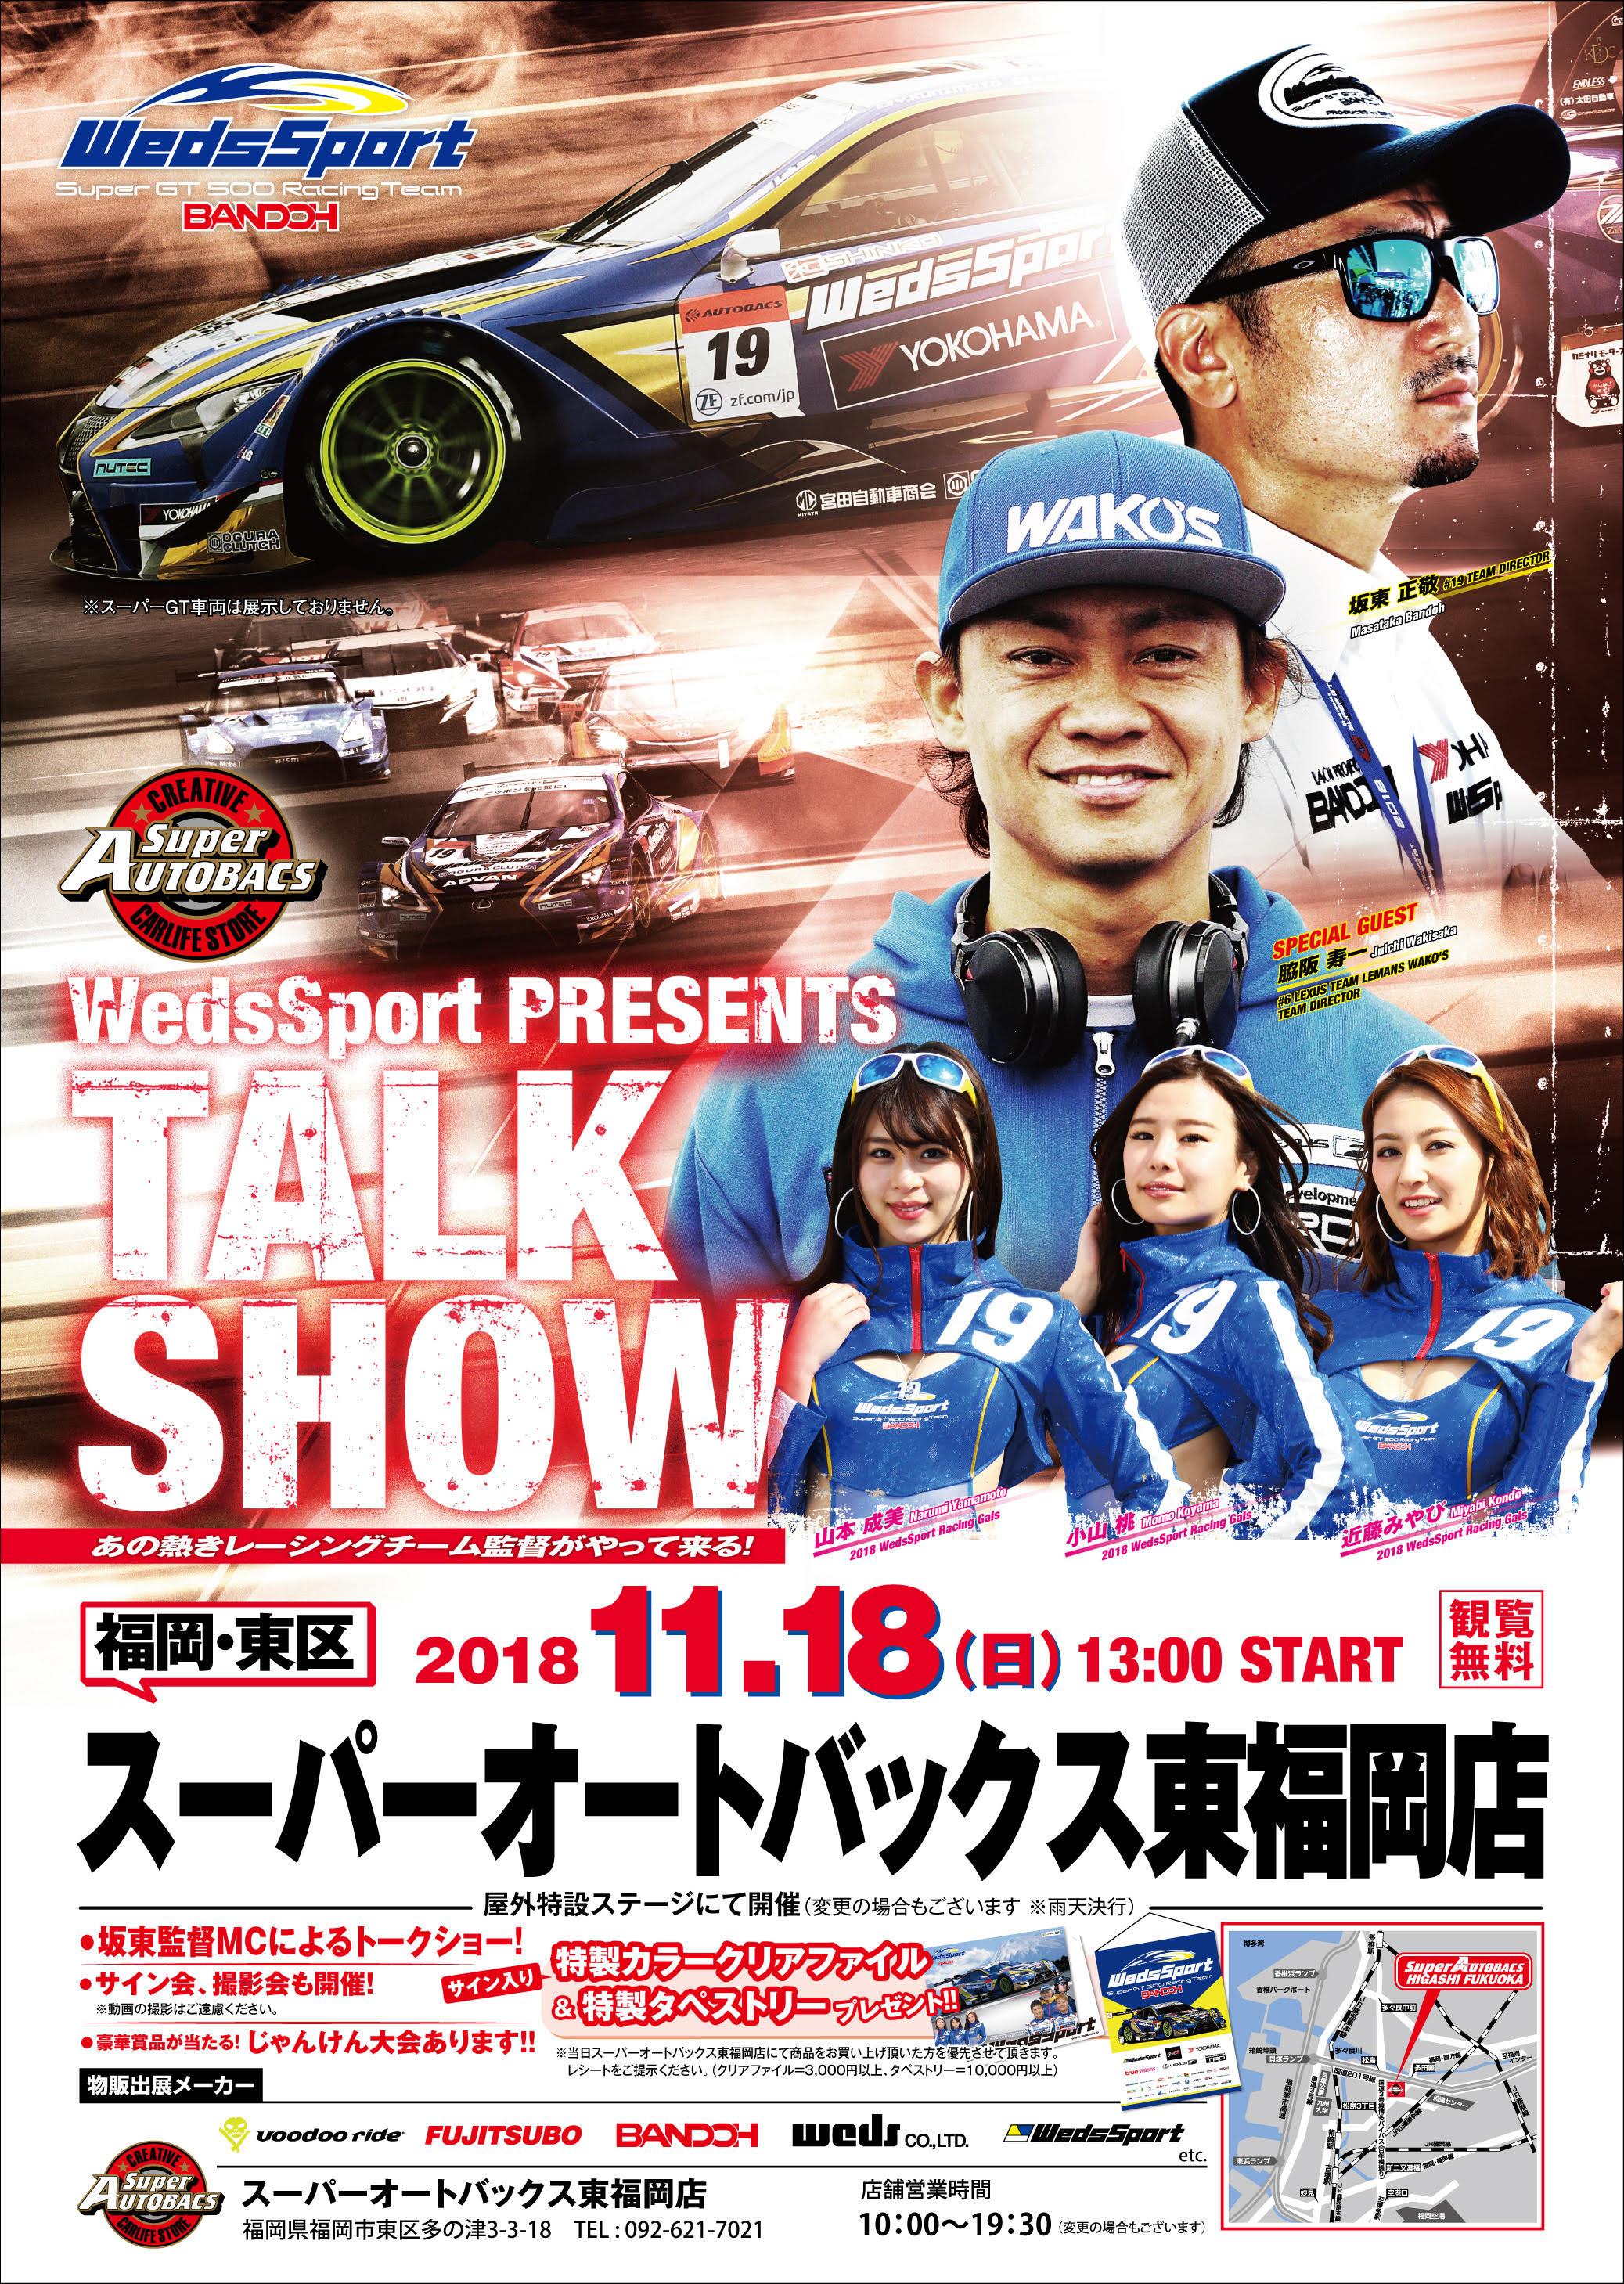 WedsSport  PRESENTS TALKSHOW in スーパーオートバックス東福岡店